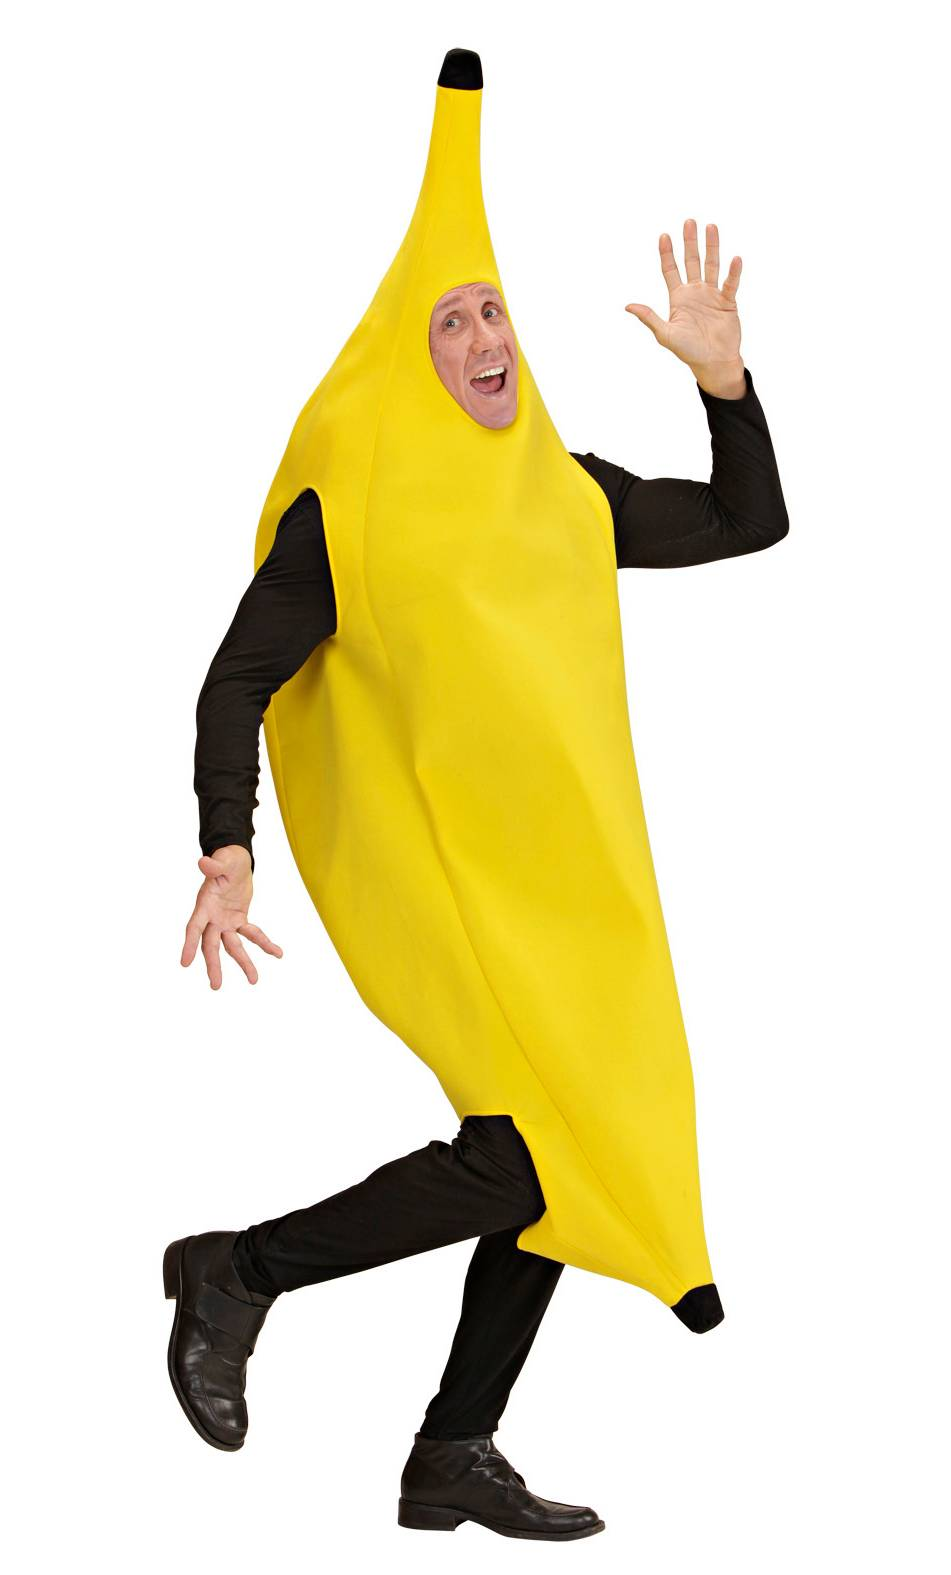 Costume de banane